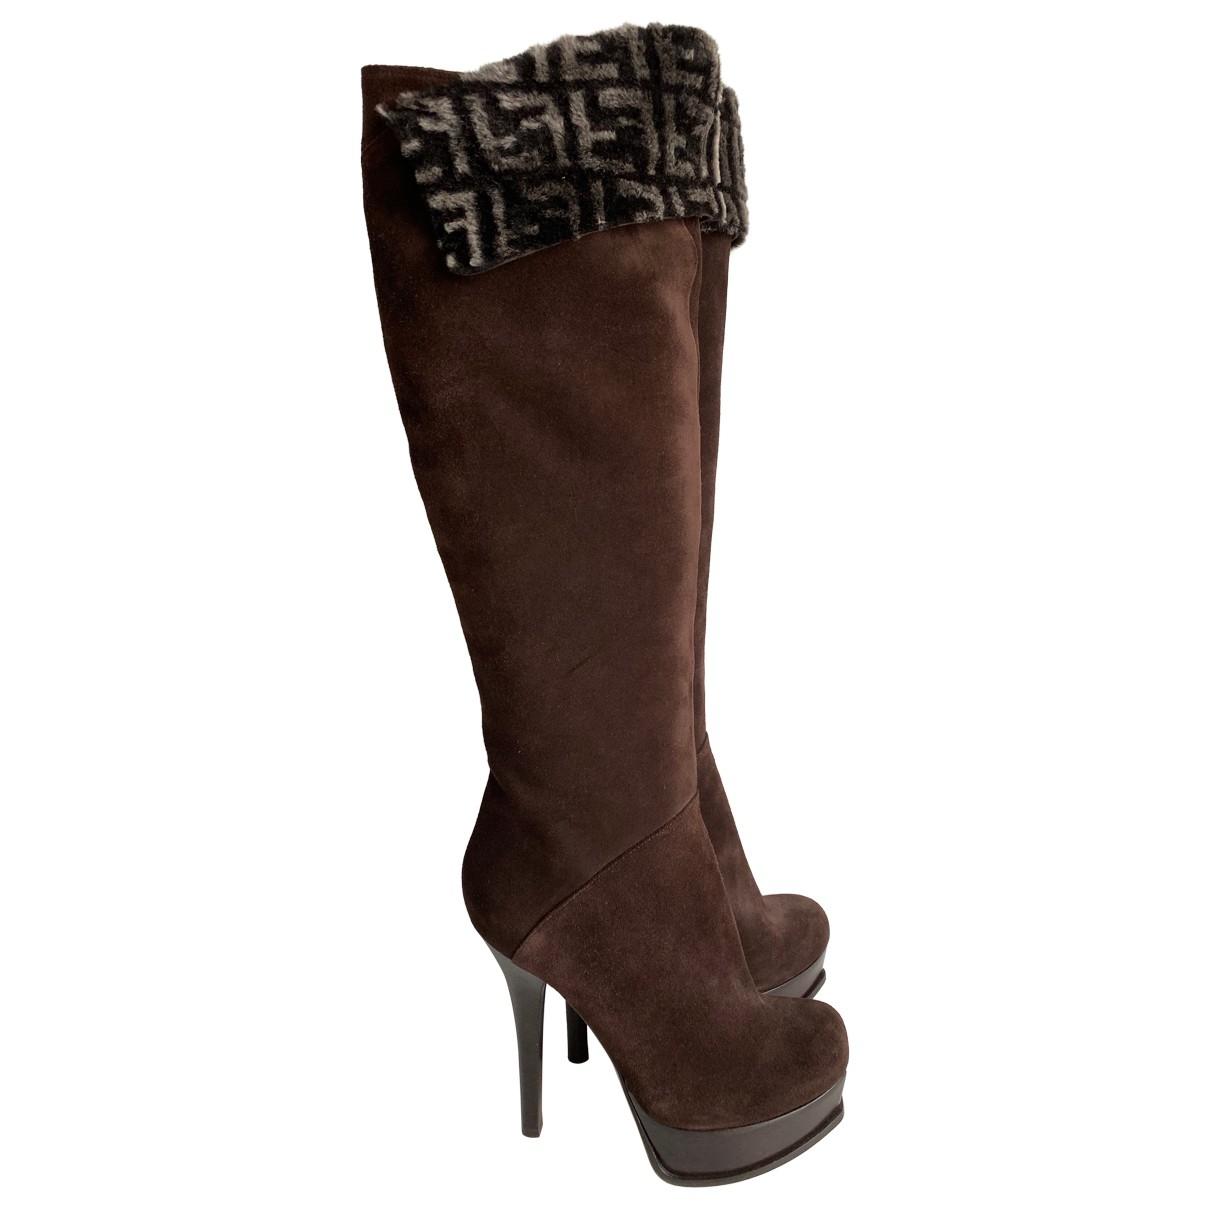 Fendi \N Brown Suede Boots for Women 38.5 EU